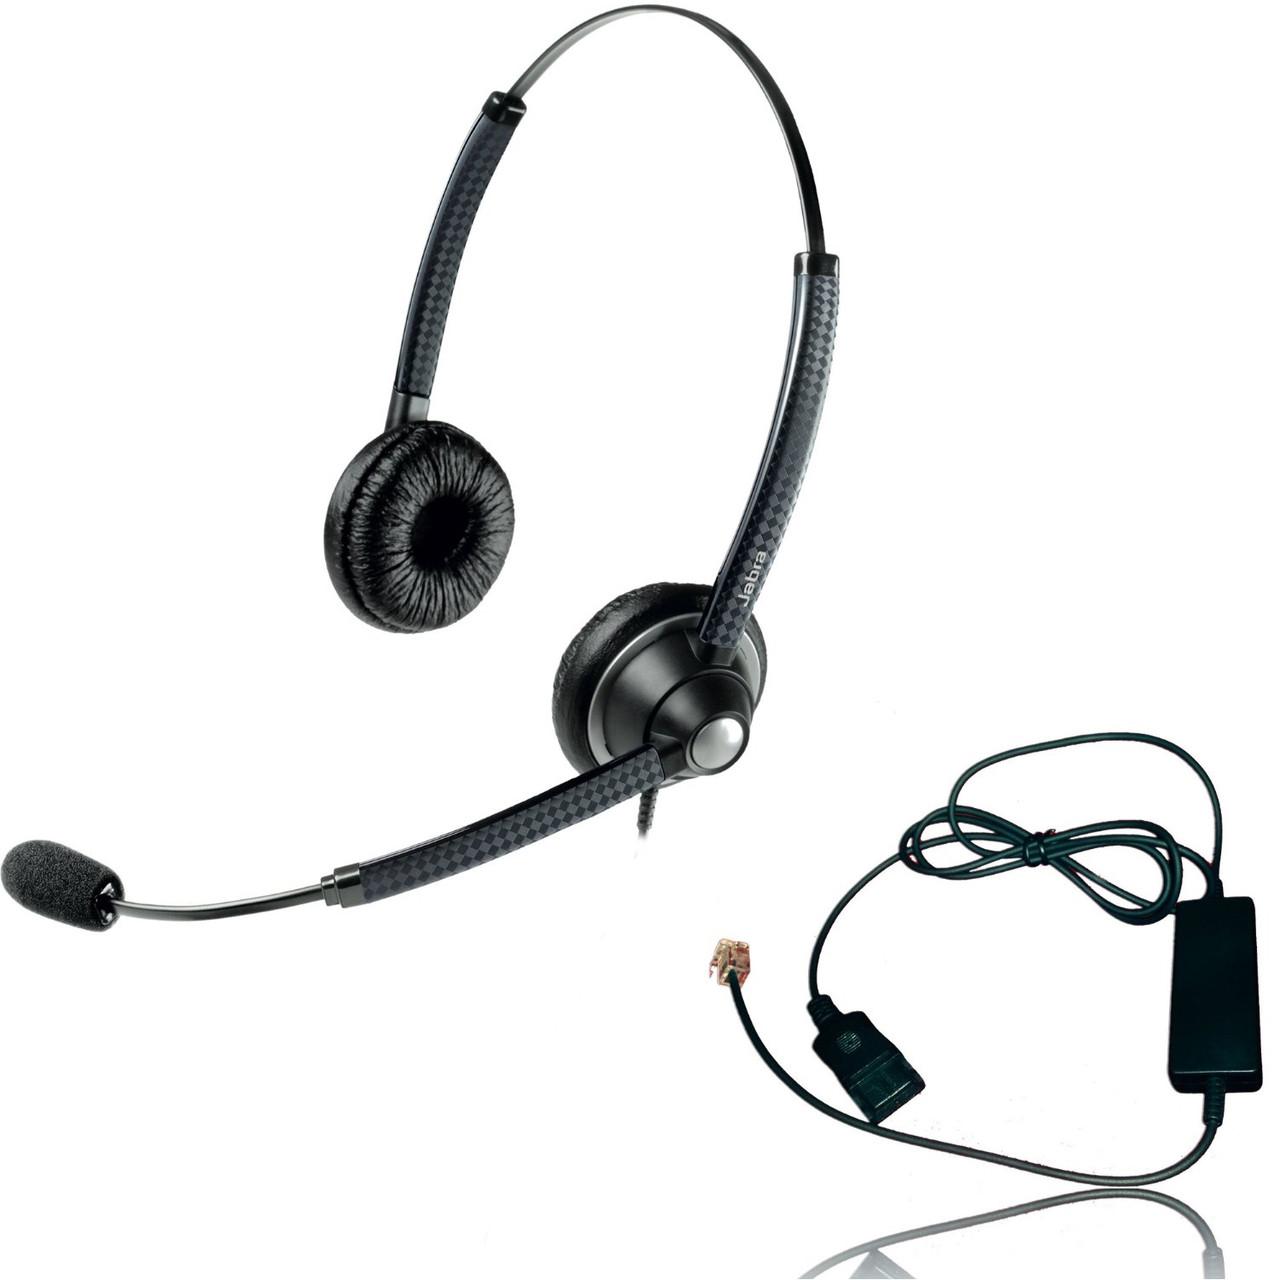 Jabra BIZ 1925 Dual Corded Headset with Jabra GN1200 Smart Cord